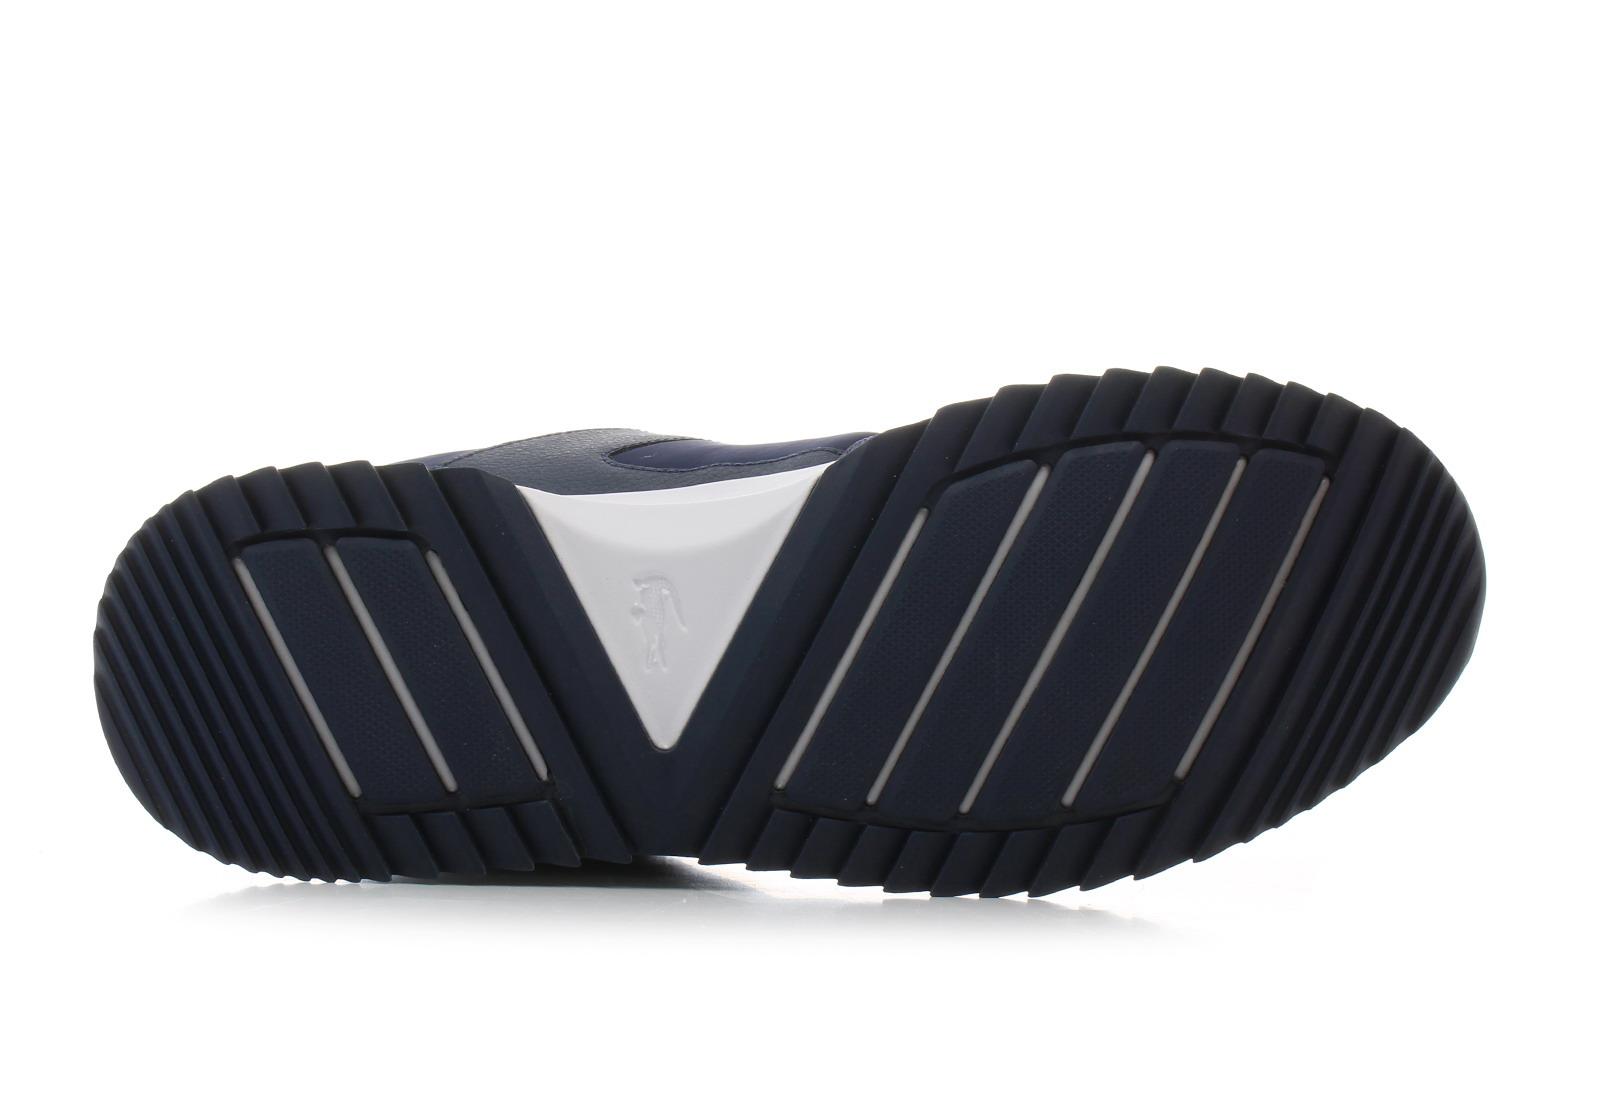 Lacoste Cipő - Joggeur 2.0 - 183SPM0022-ND1 - Office Shoes Magyarország 4bd053ffc2